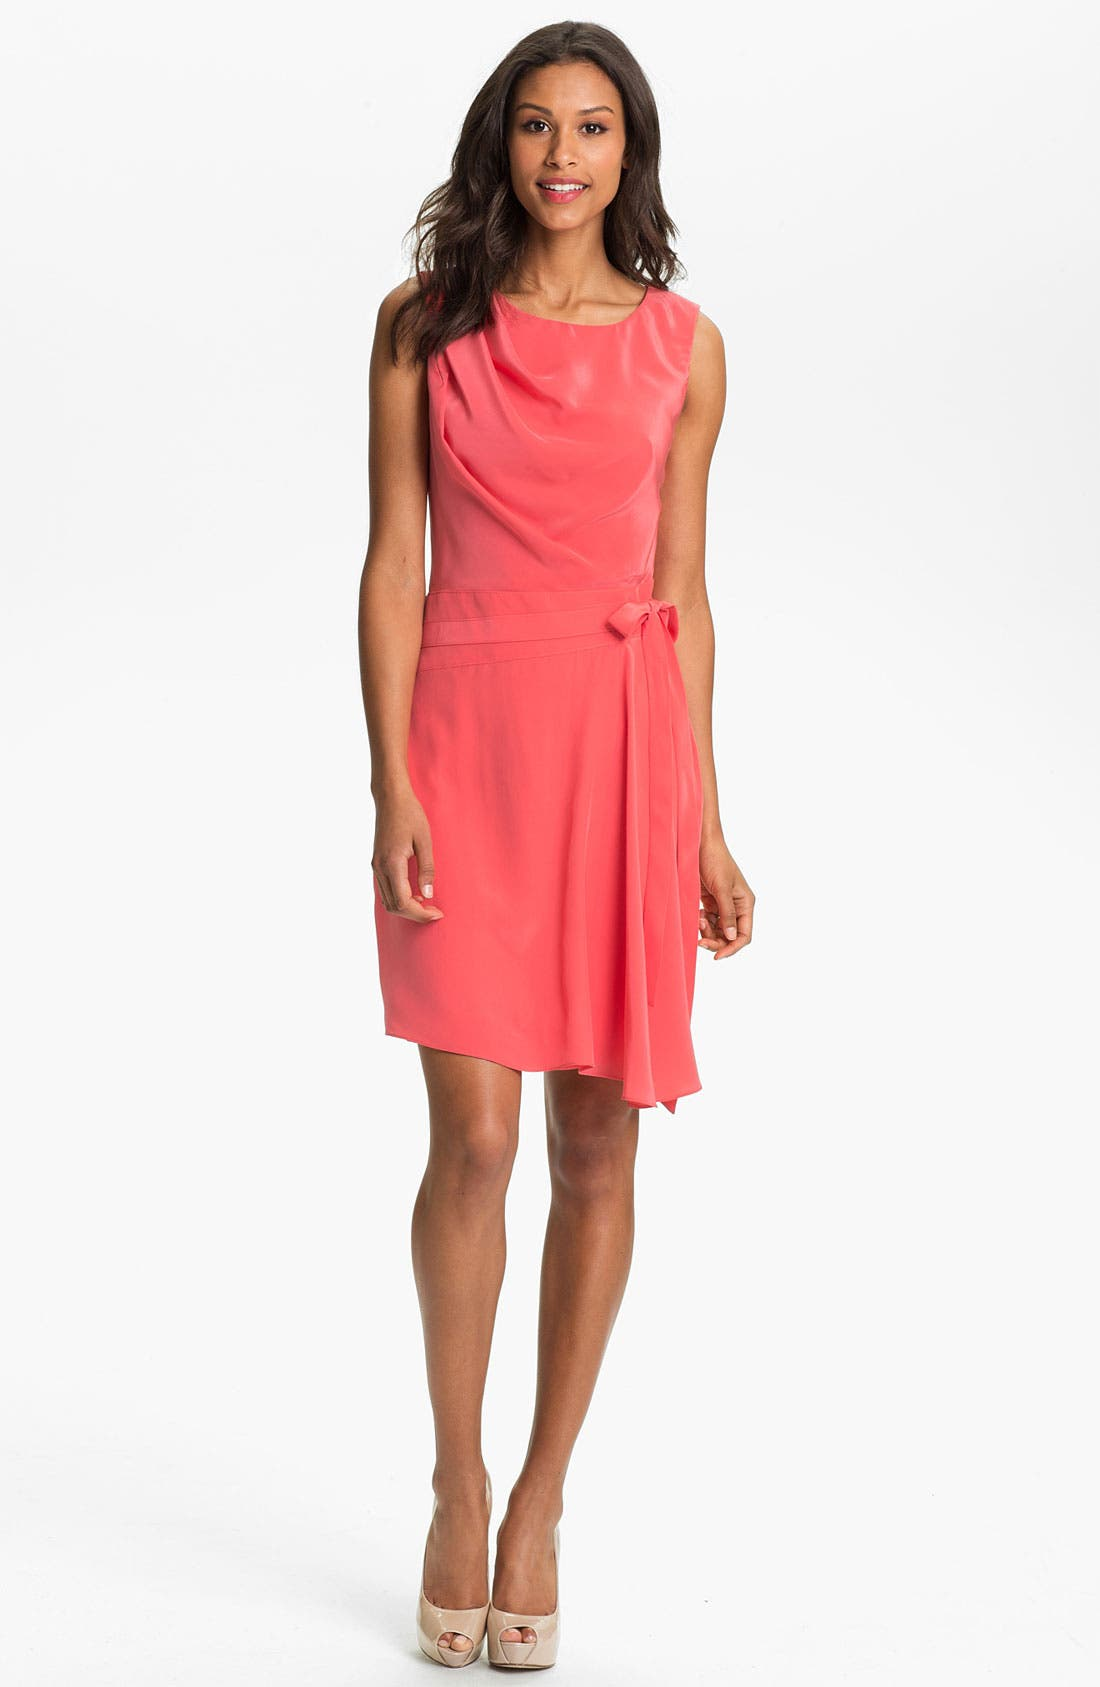 Main Image - Suzi Chin Maggy Boutique Draped Faux Wrap Dress